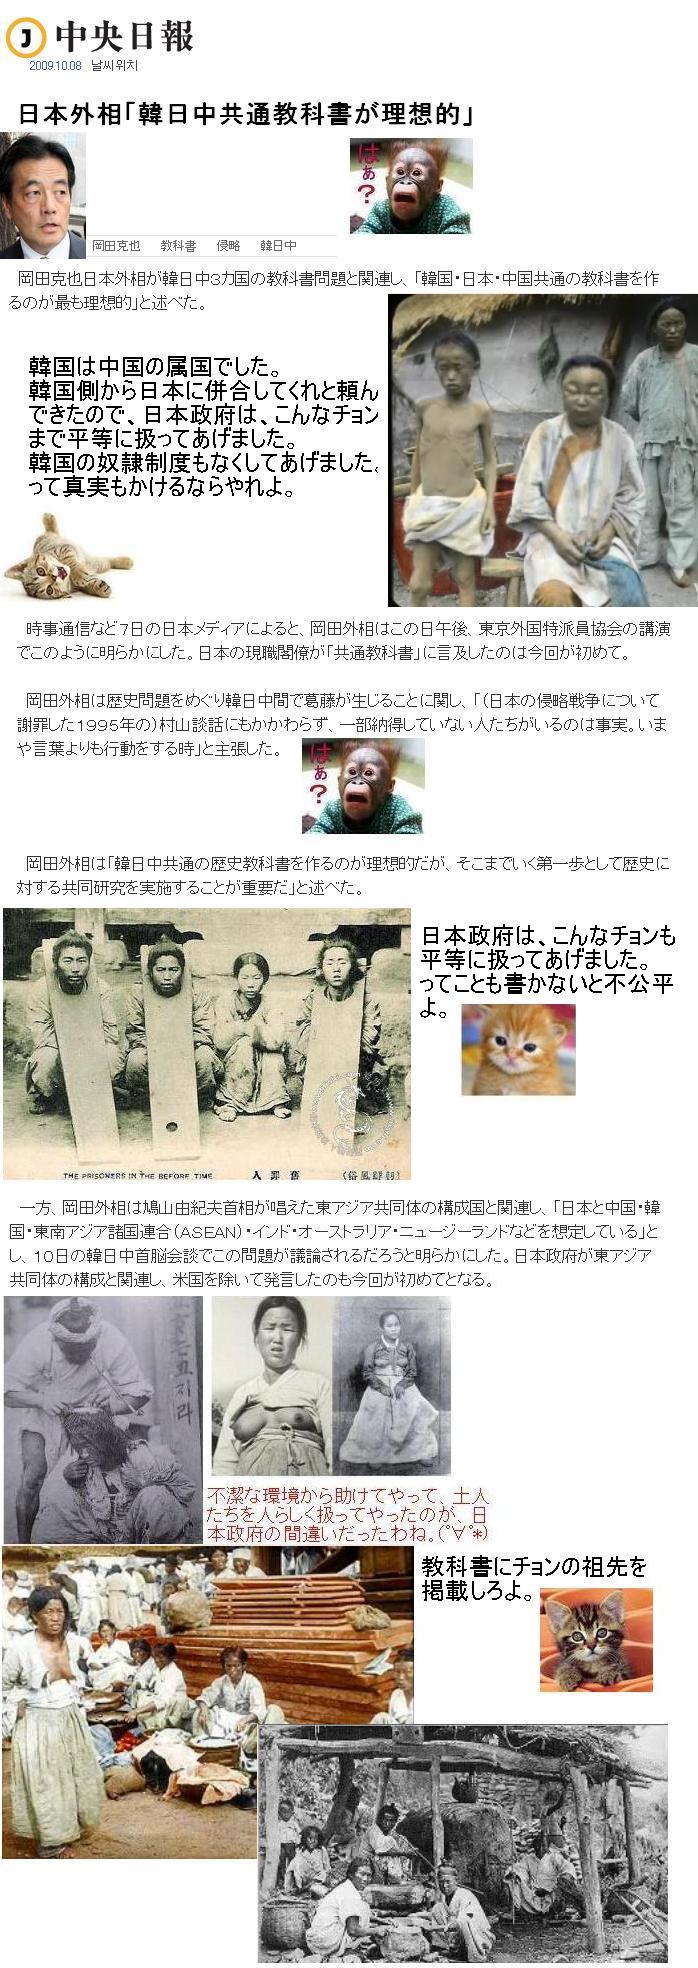 okarakyokasyochon1.jpg